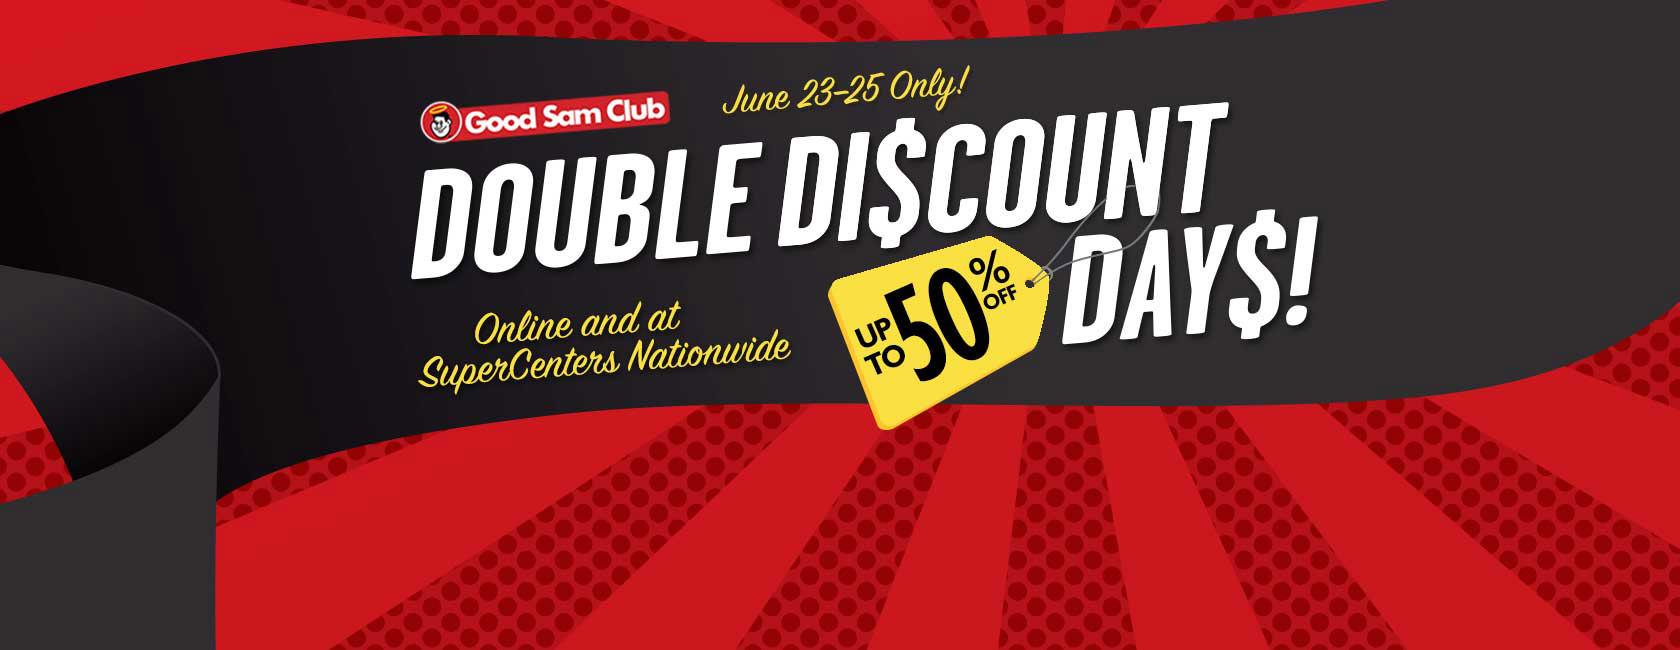 Good Sam Club Double Discount Days